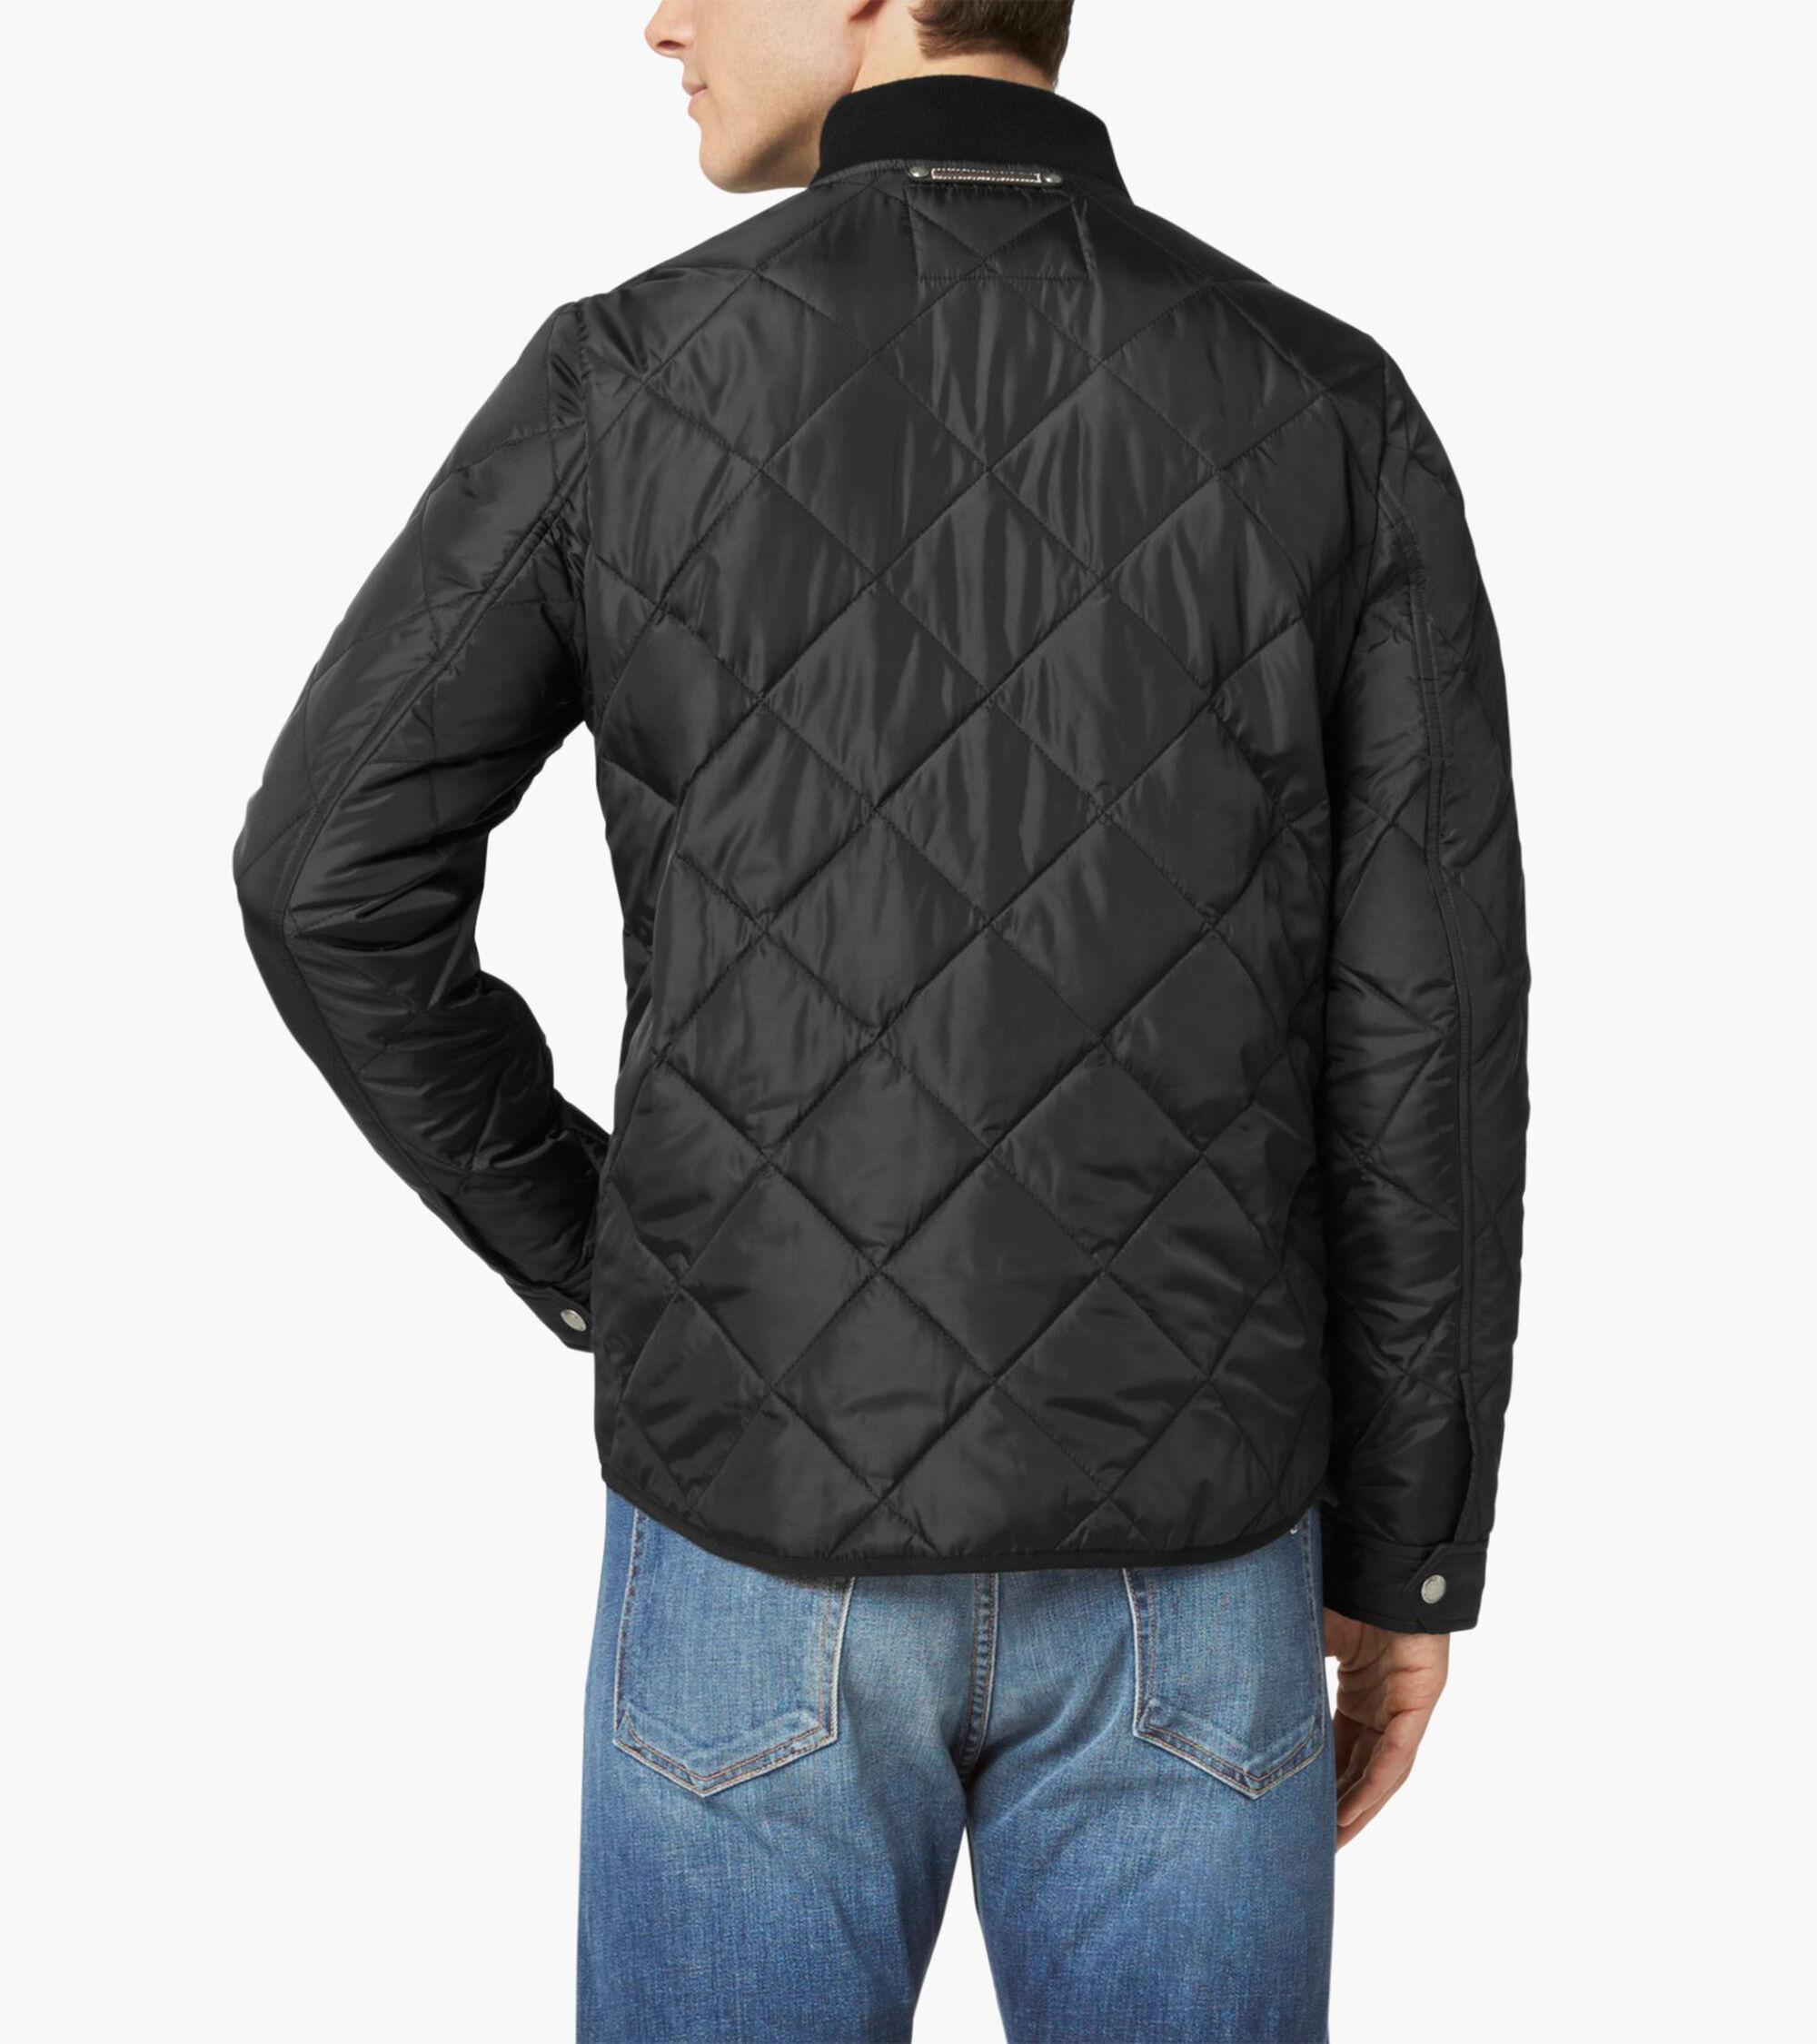 Men's Quilted Varsity Jacket in Black | Cole Haan : cole haan leather jacket diamond quilted - Adamdwight.com